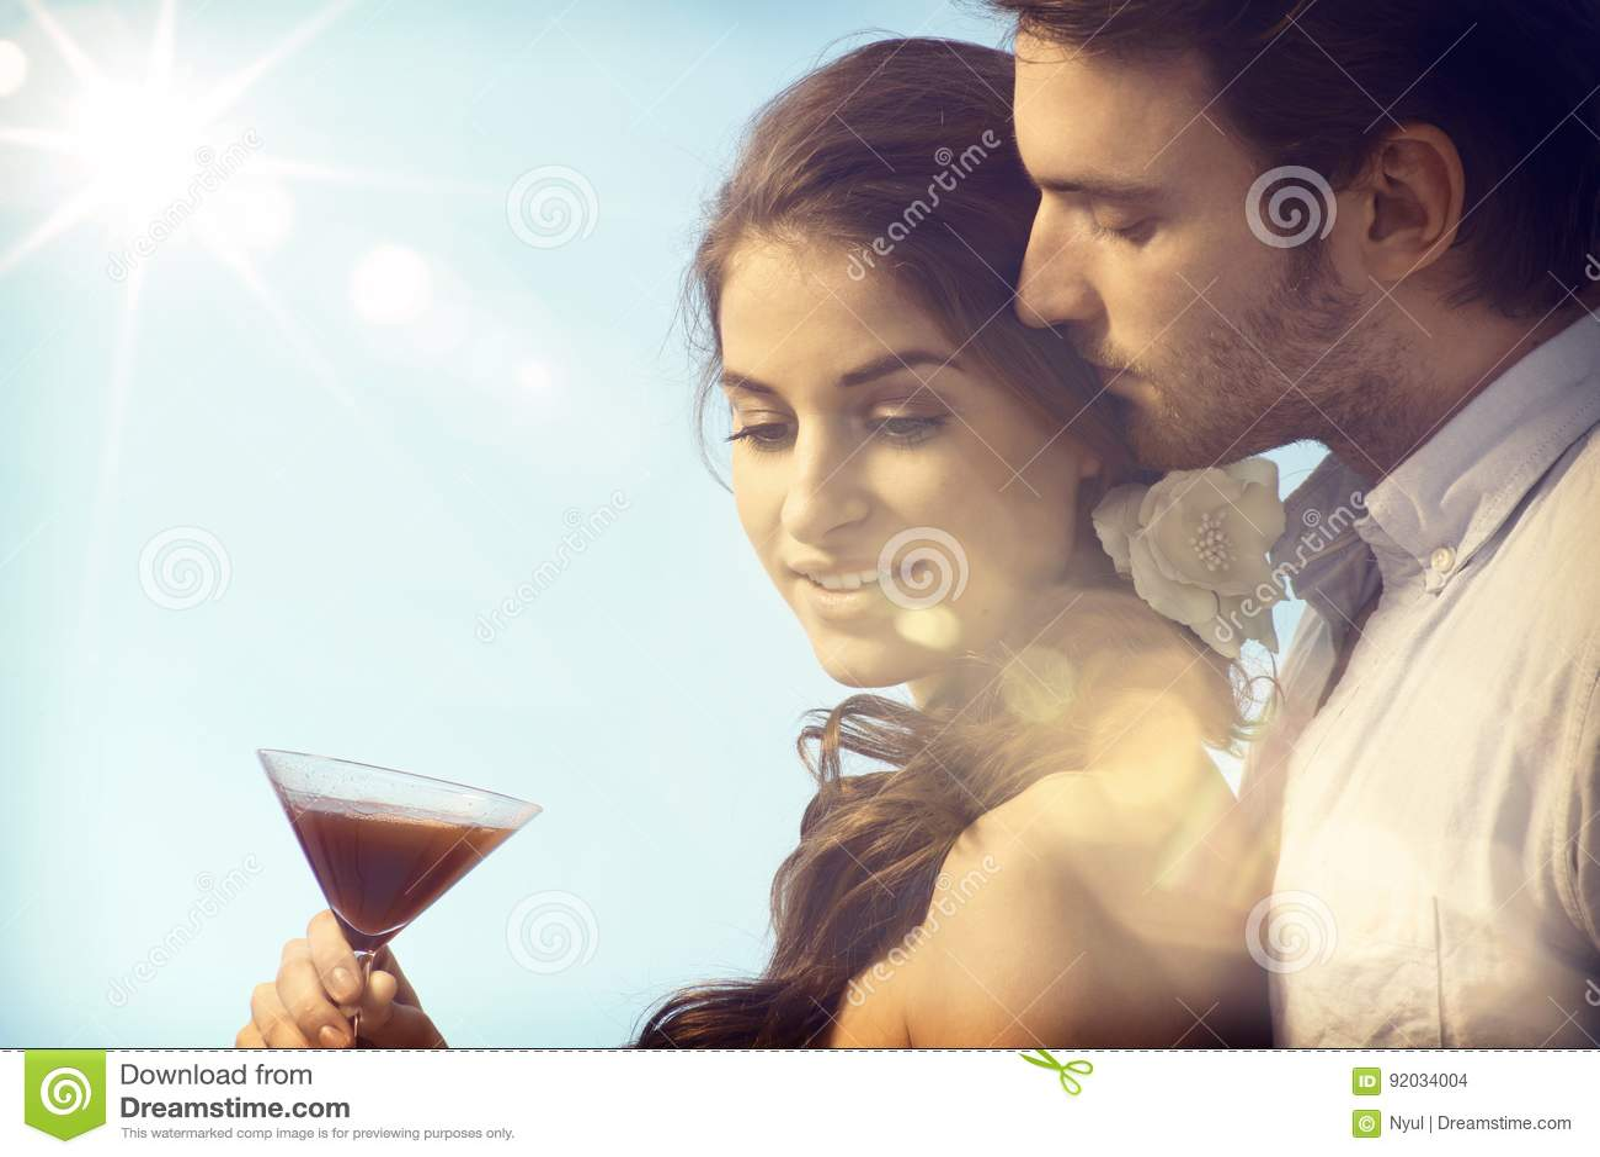 Romantic couple drinking in sunset